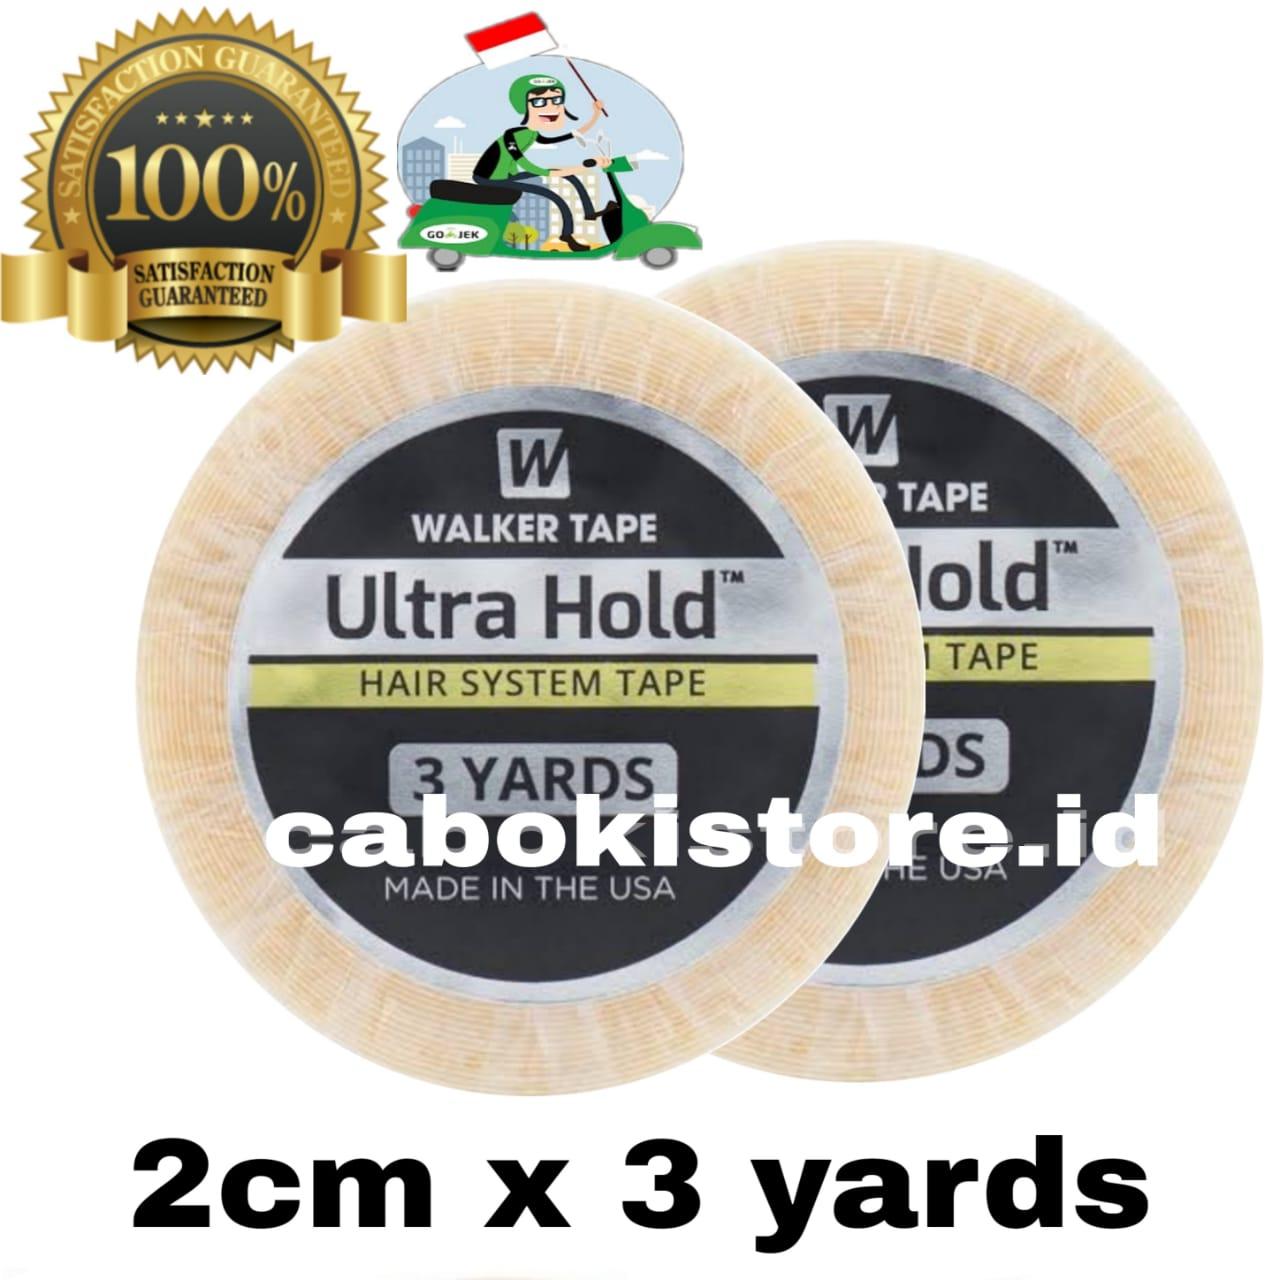 Toupee Tape Walker Tape Ultra Hold (2cm x 3 Yards) thumbnail